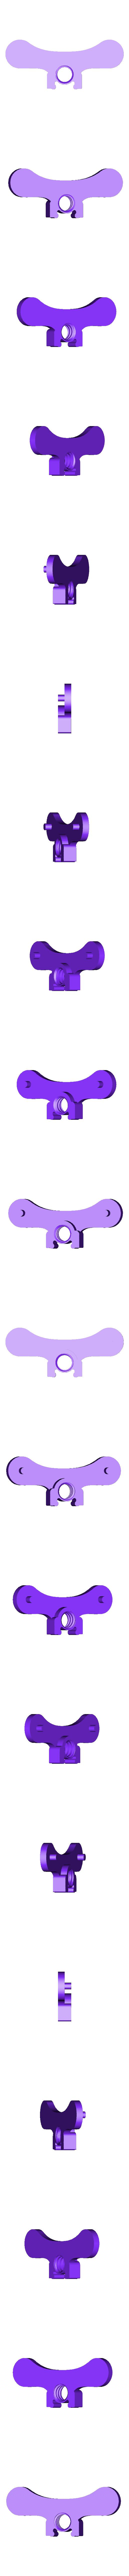 Filament-Spool-Mount-Universal_-_Slider.stl Download free STL file Filament Spool Holder - Bearings and custom width • 3D print design, csigshoj